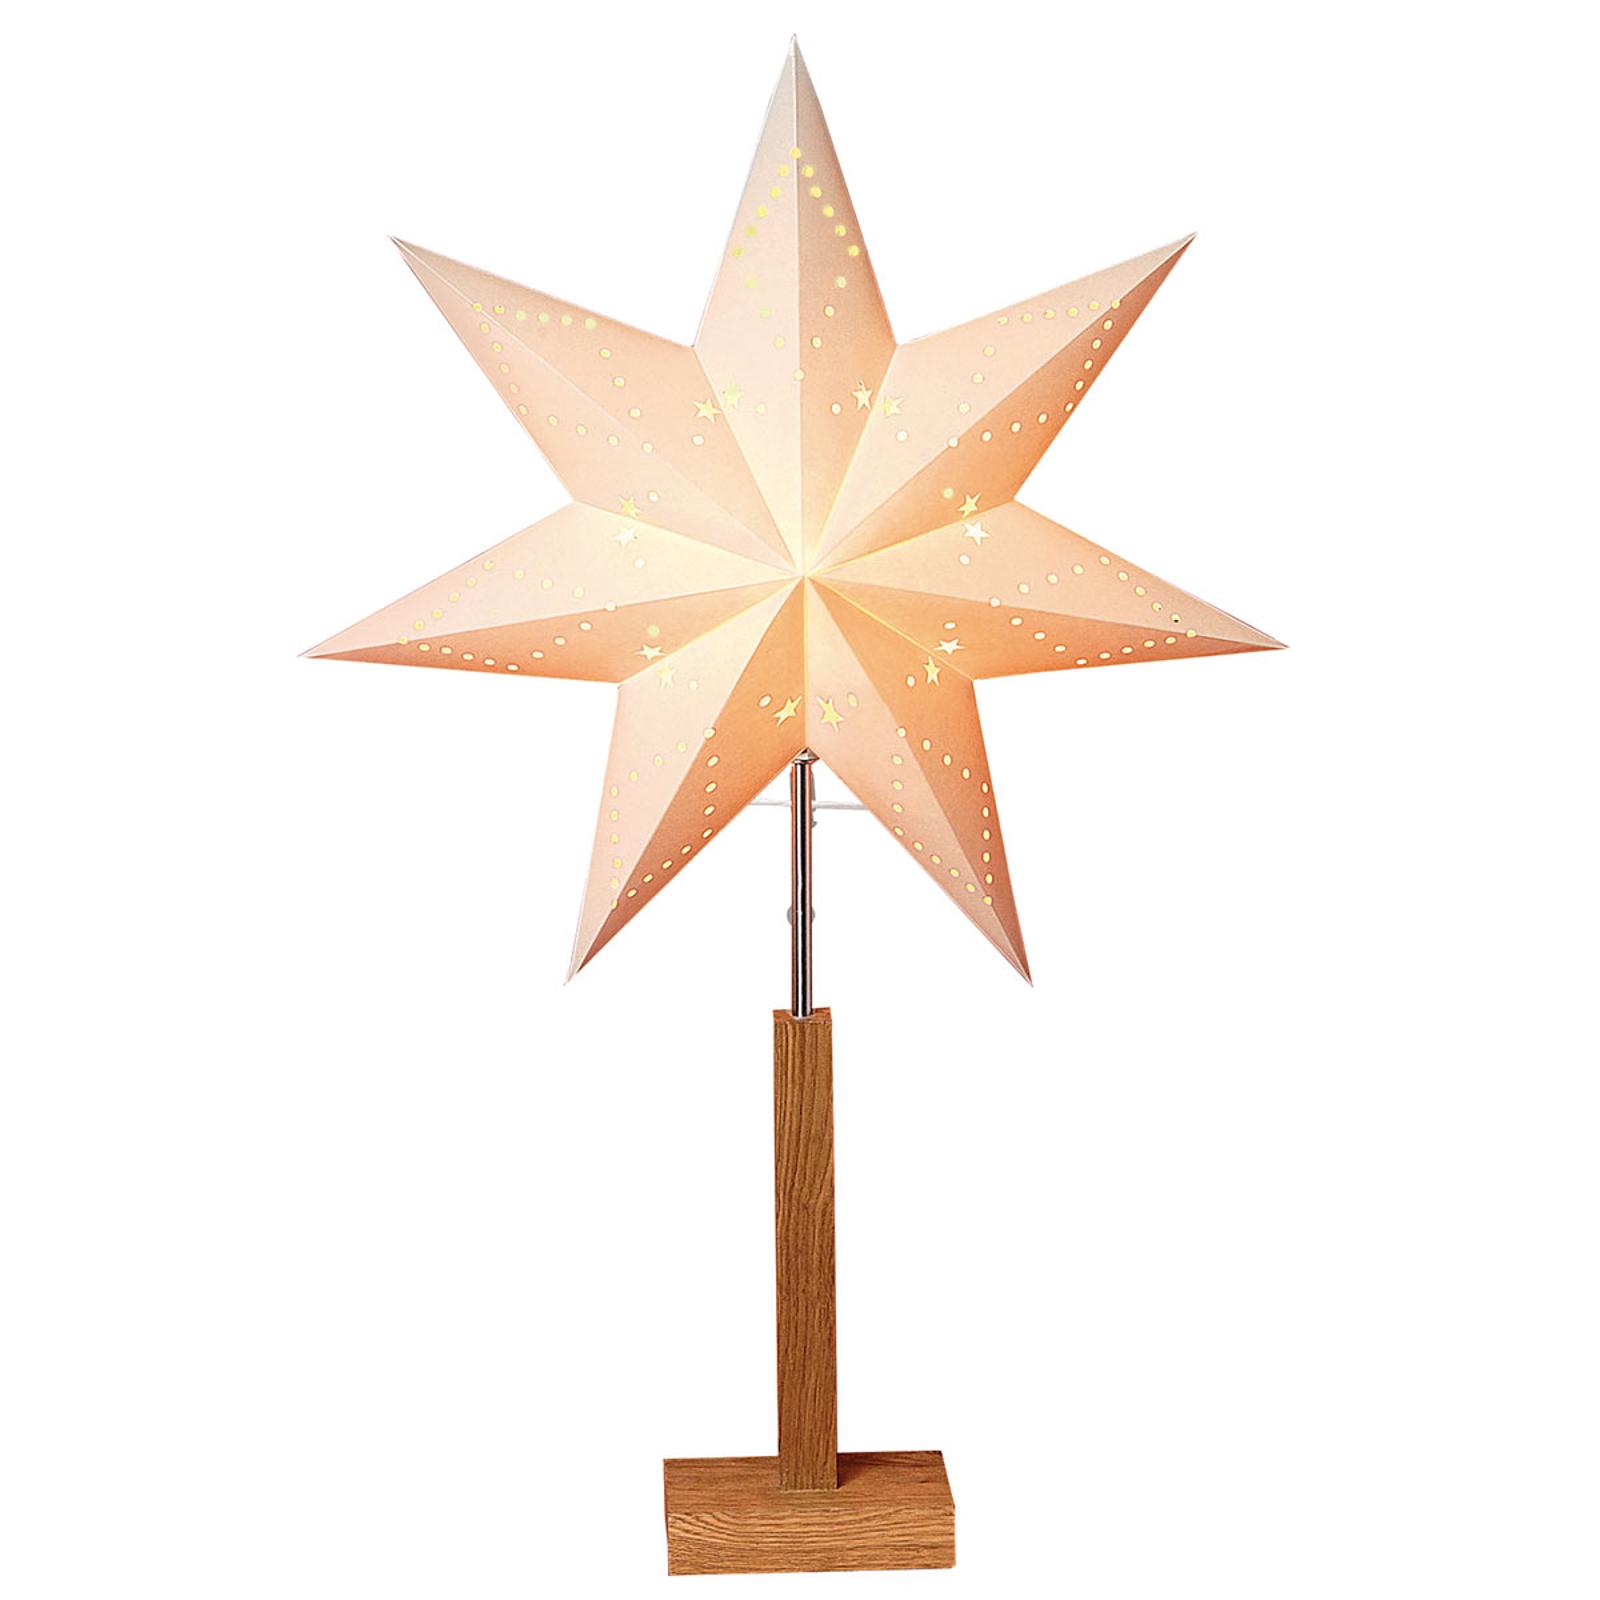 Karo - stående dekolampe med stjernemønster